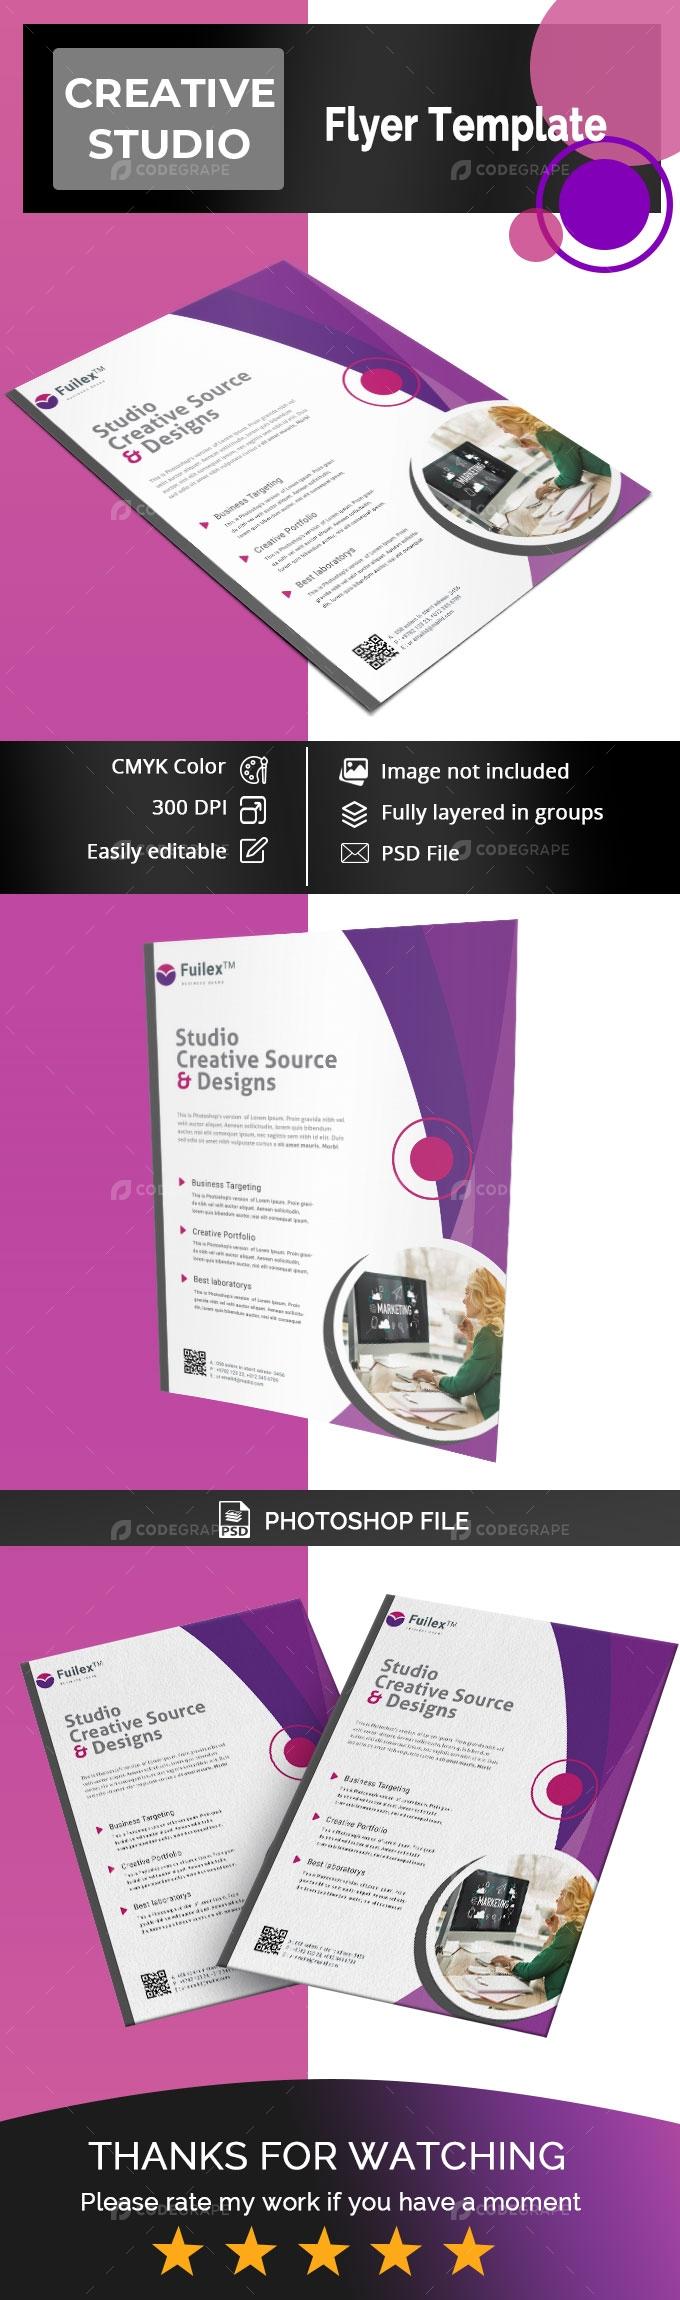 Creative Studio Flyer